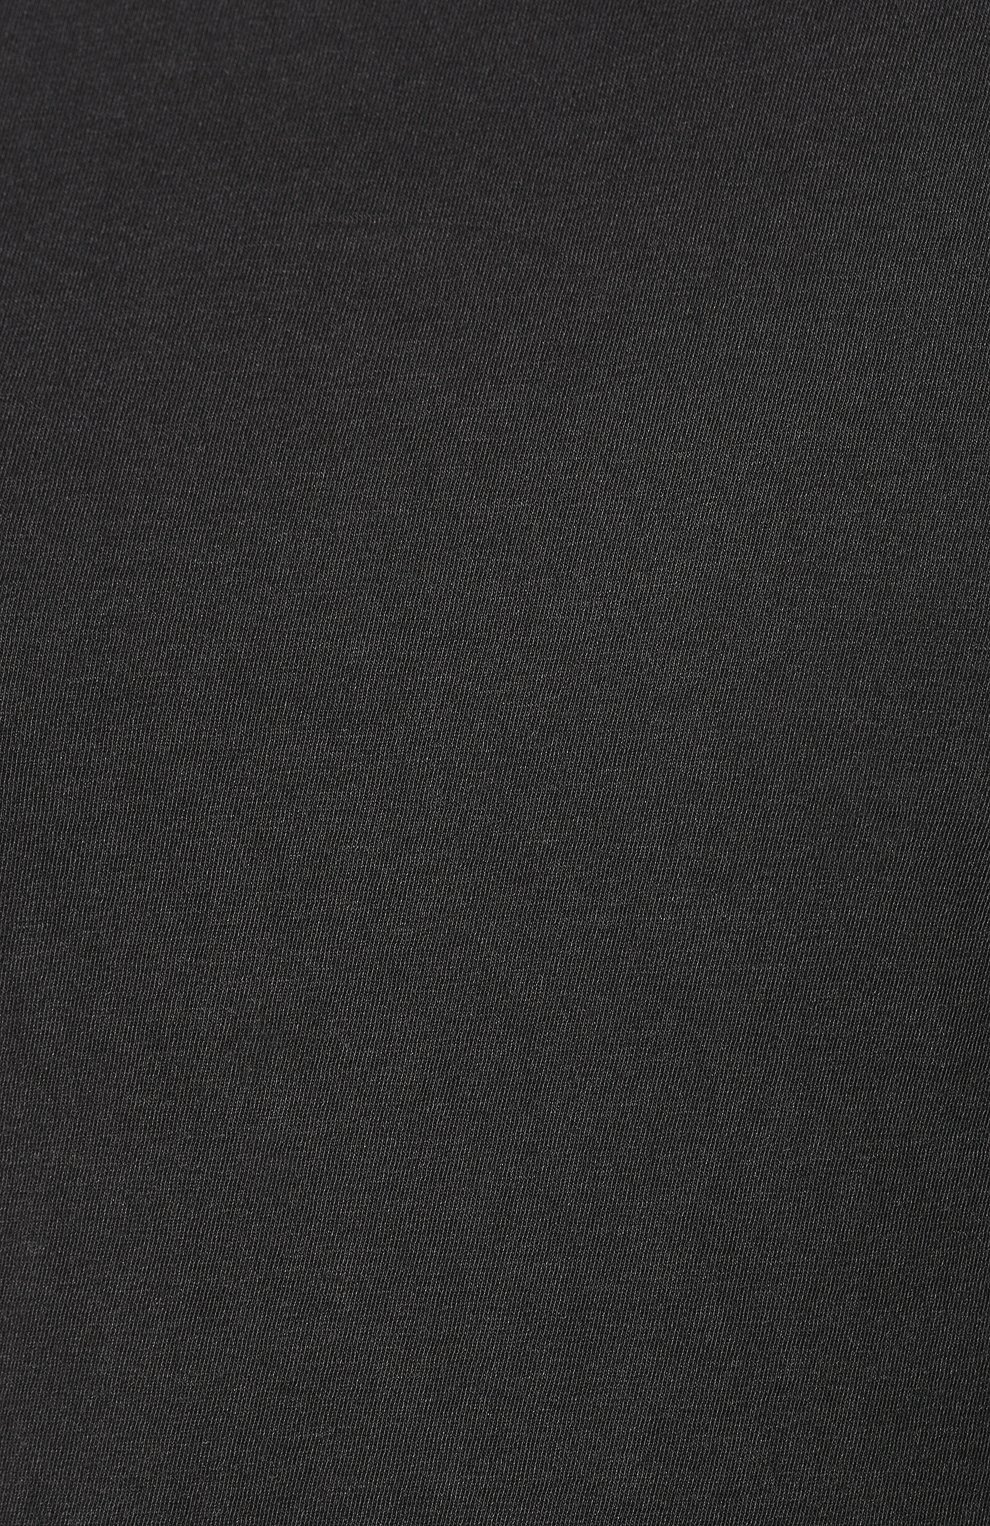 Мужская хлопковая футболка JAMES PERSE серого цвета, арт. MLJ3311 | Фото 5